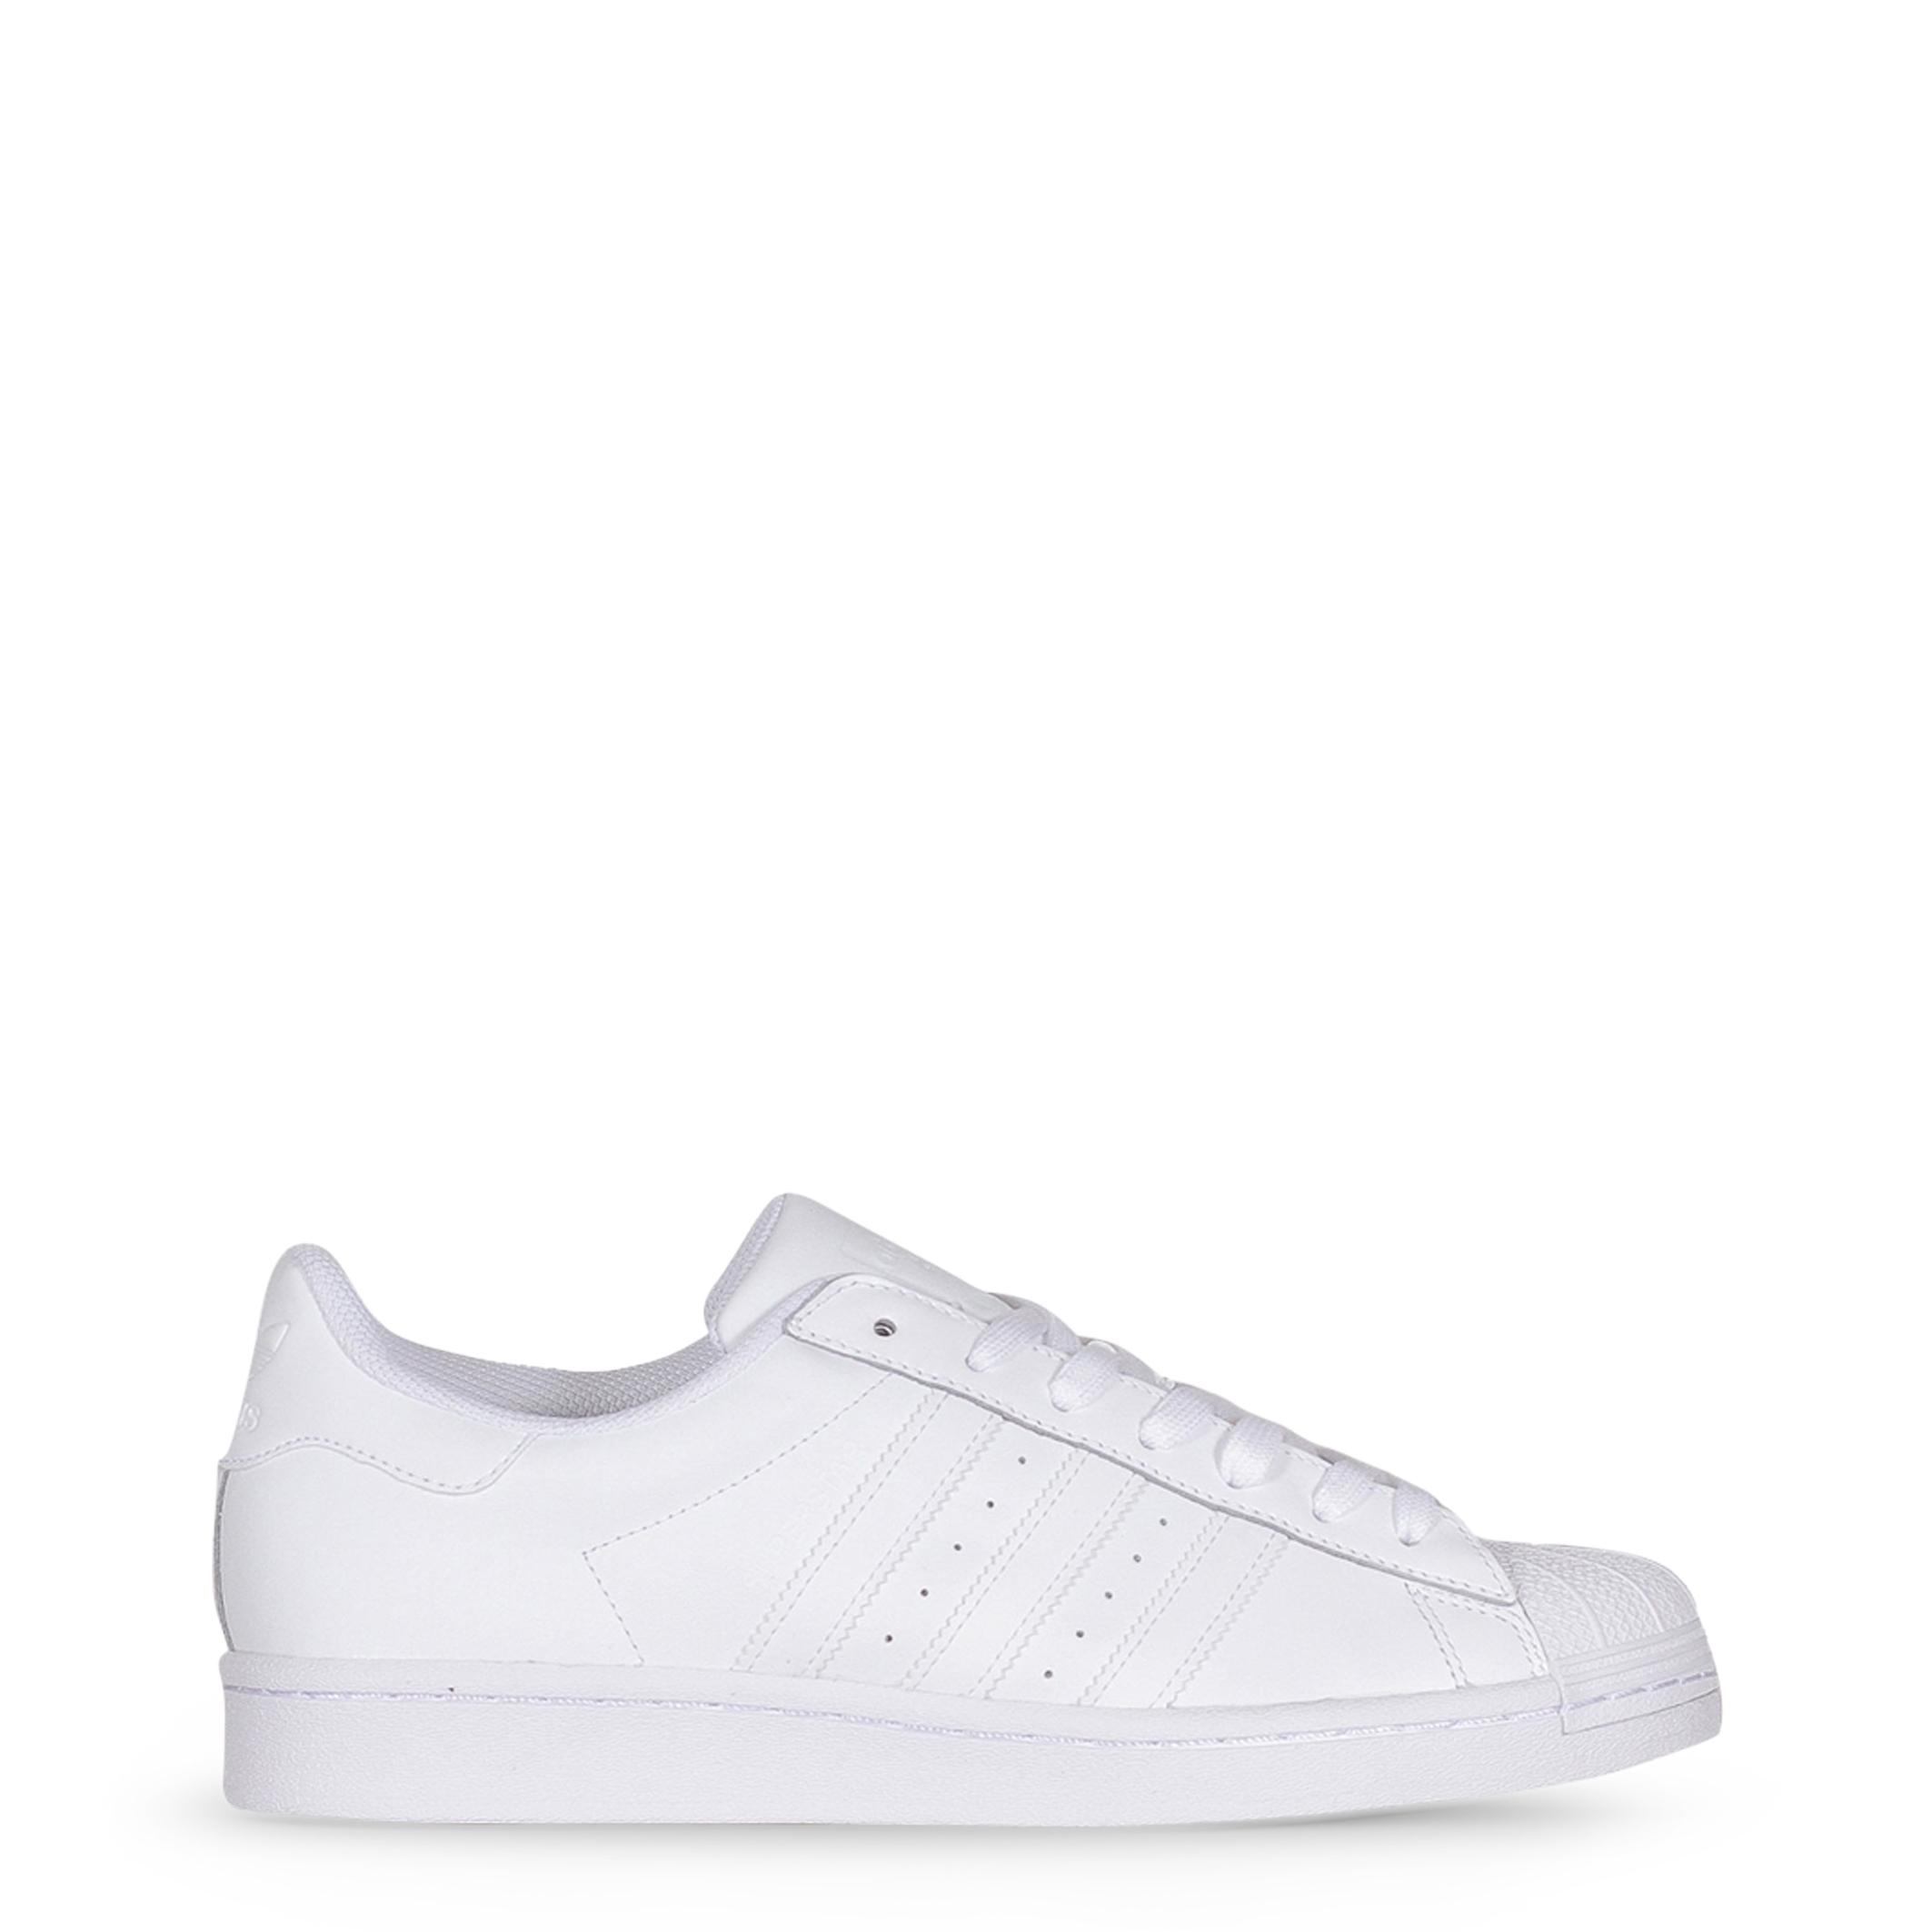 Pantofi sport Adidas Superstar Alb